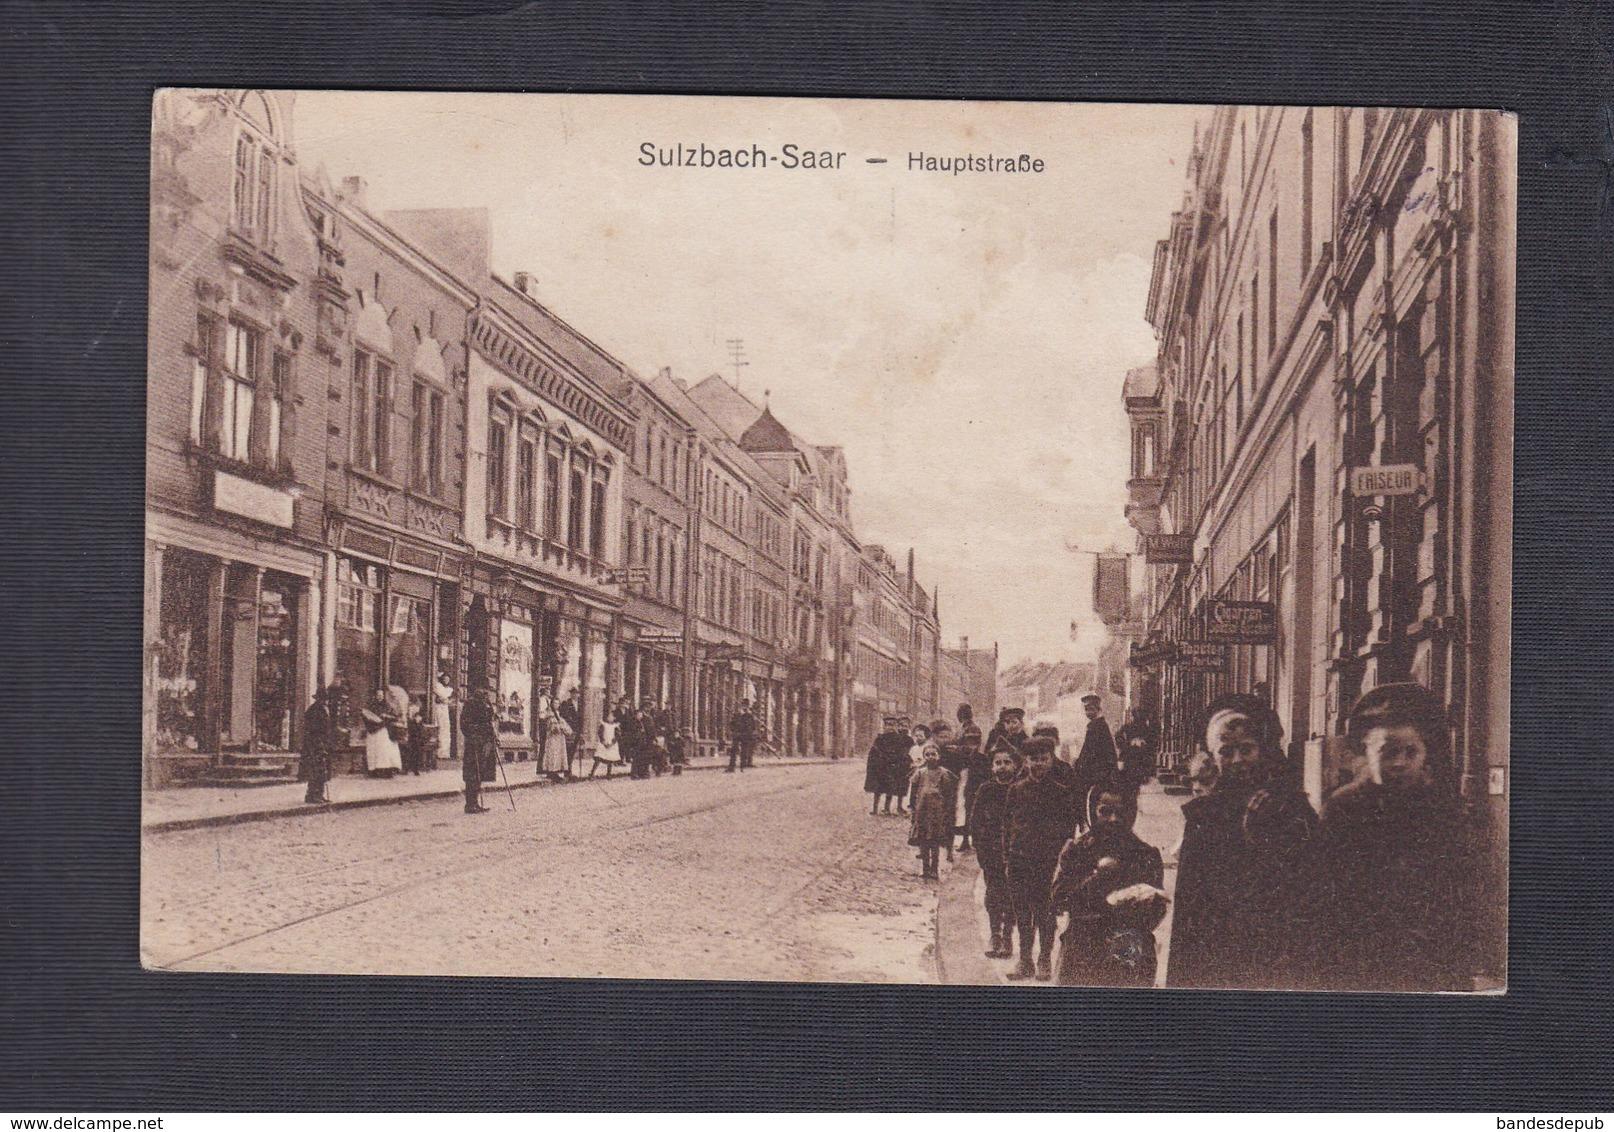 Vente Immediate AK Sulzbach Saar - Hauptstrasse ( Animée Ed. Carl Wildt) - Other